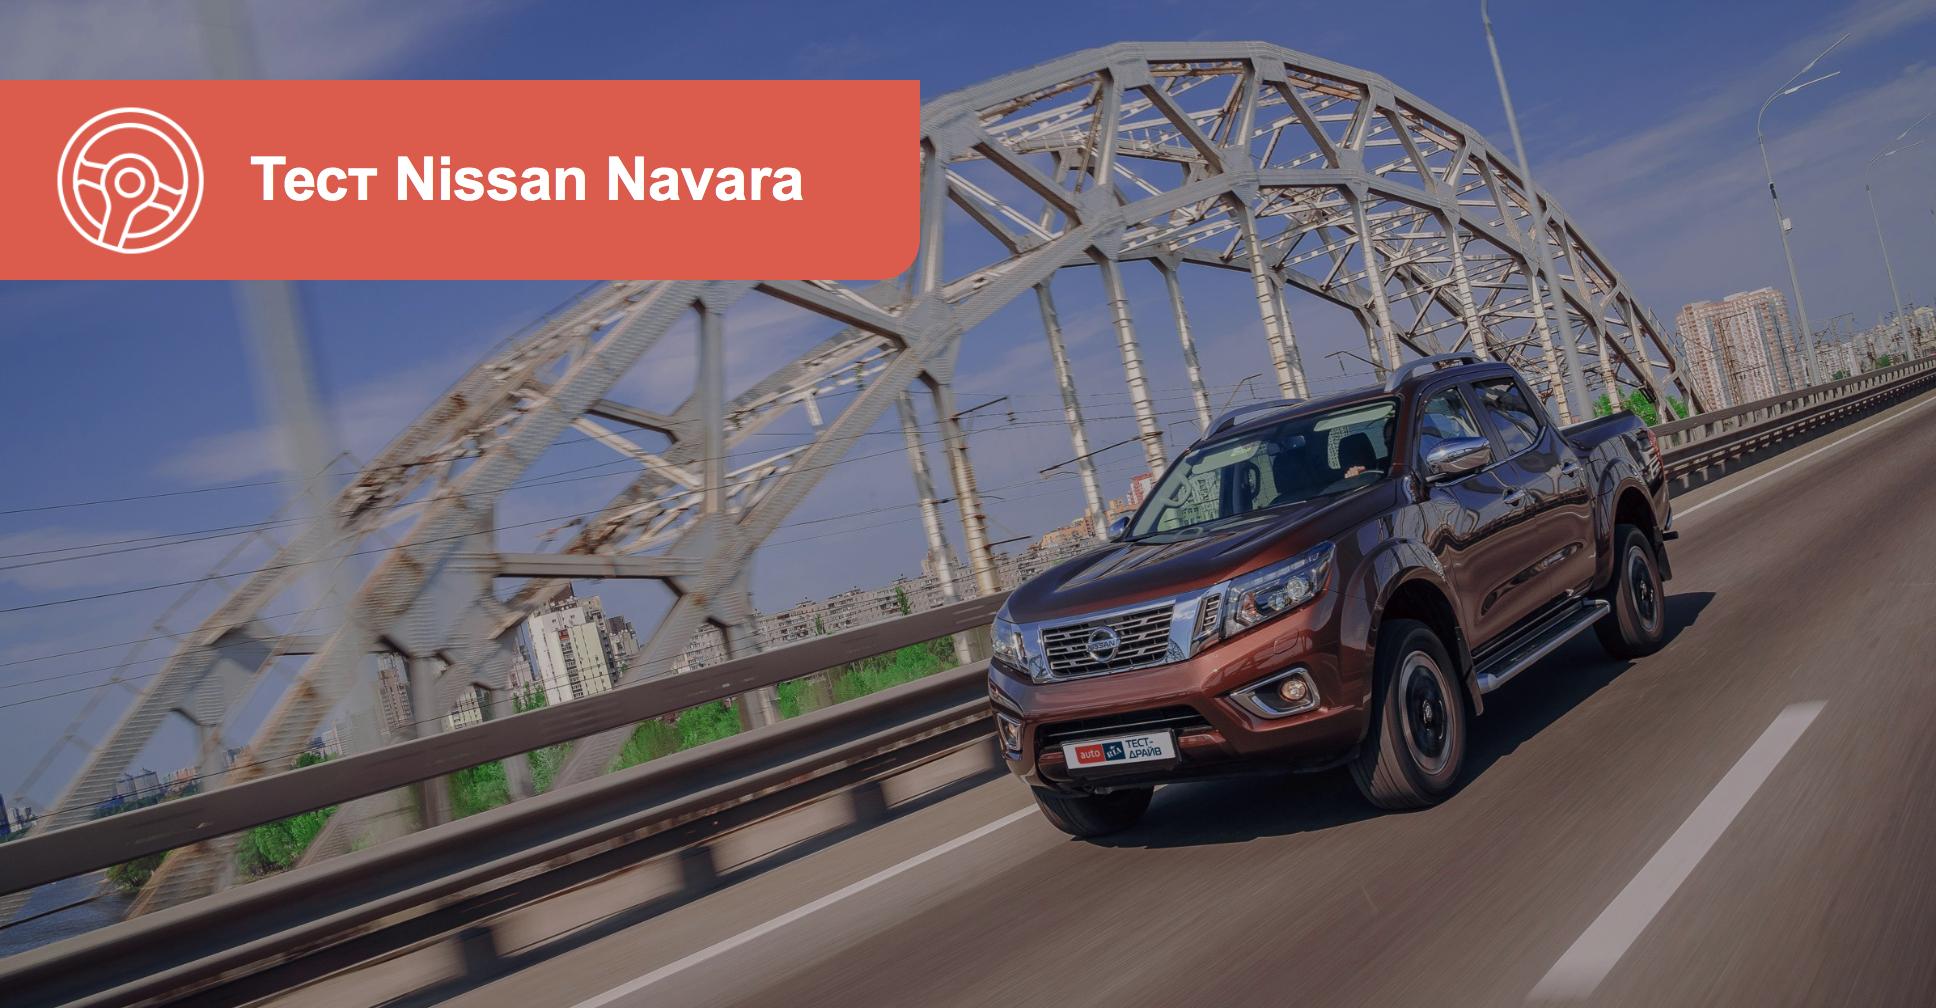 Ниссан Навара 2020 тест драйв и обзор Nissan Navara с фото